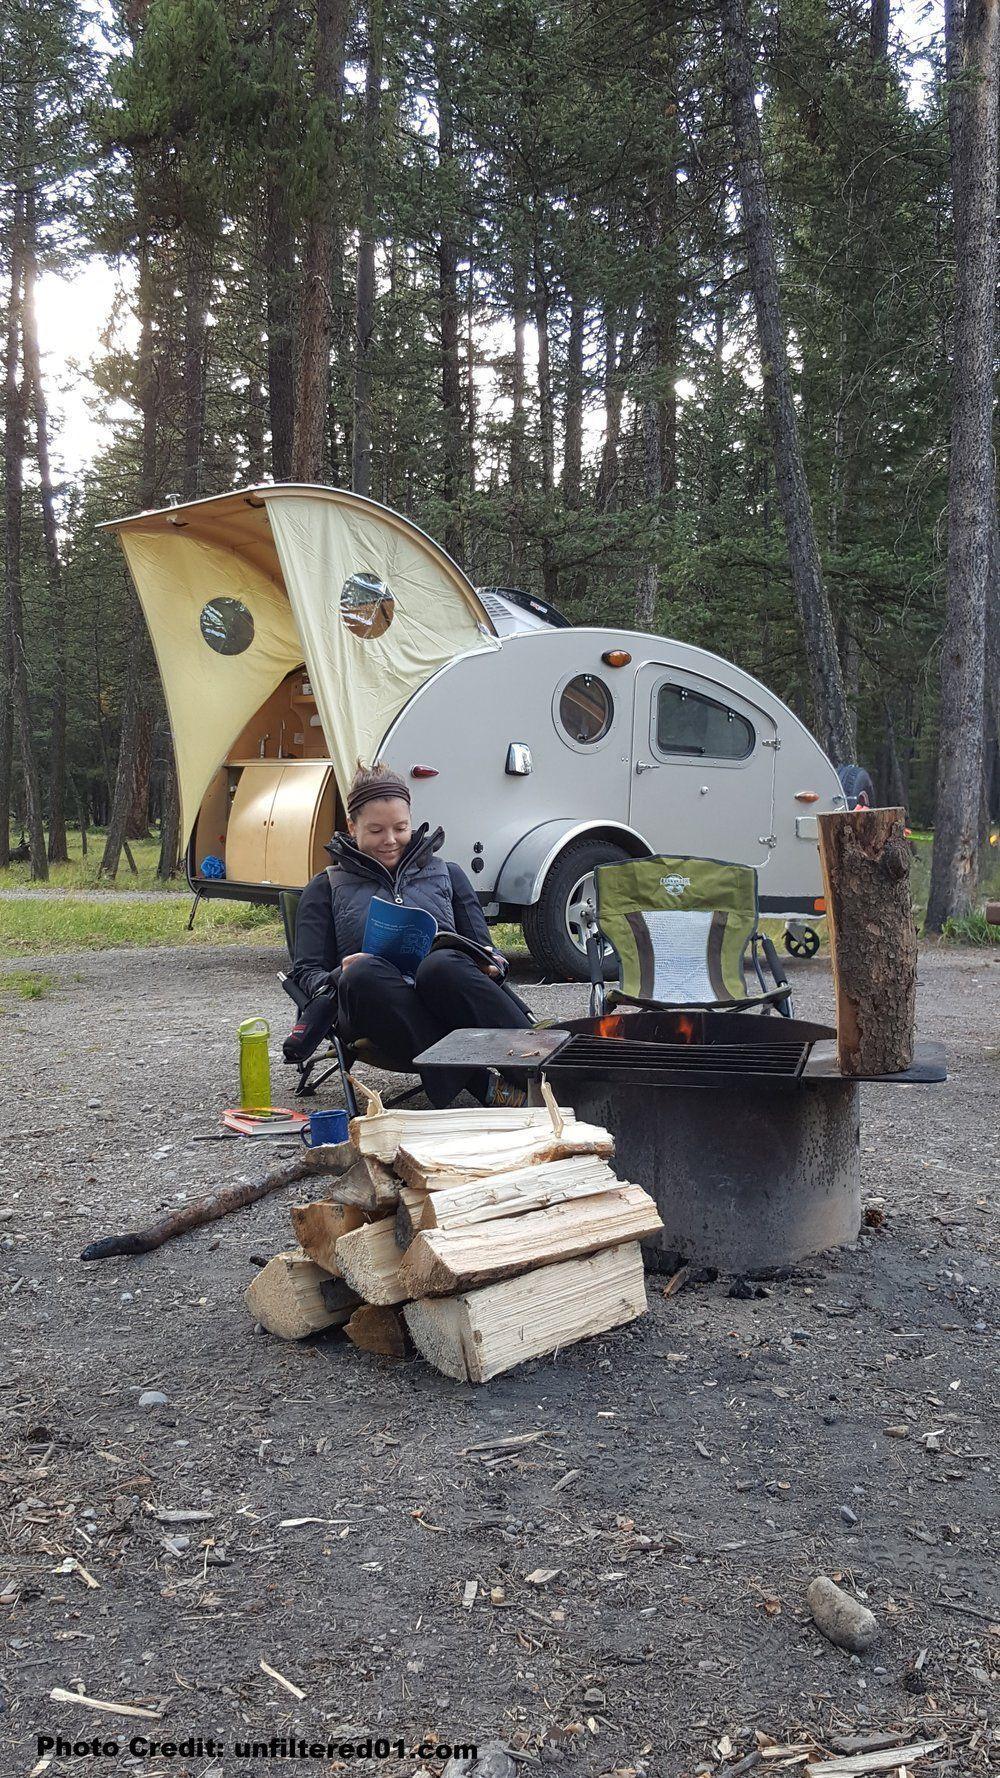 20 Coolest Diy Camper Trailer Ideas | Camperism -  20 Coolest Diy Camper Trailer Ideas | Camperism